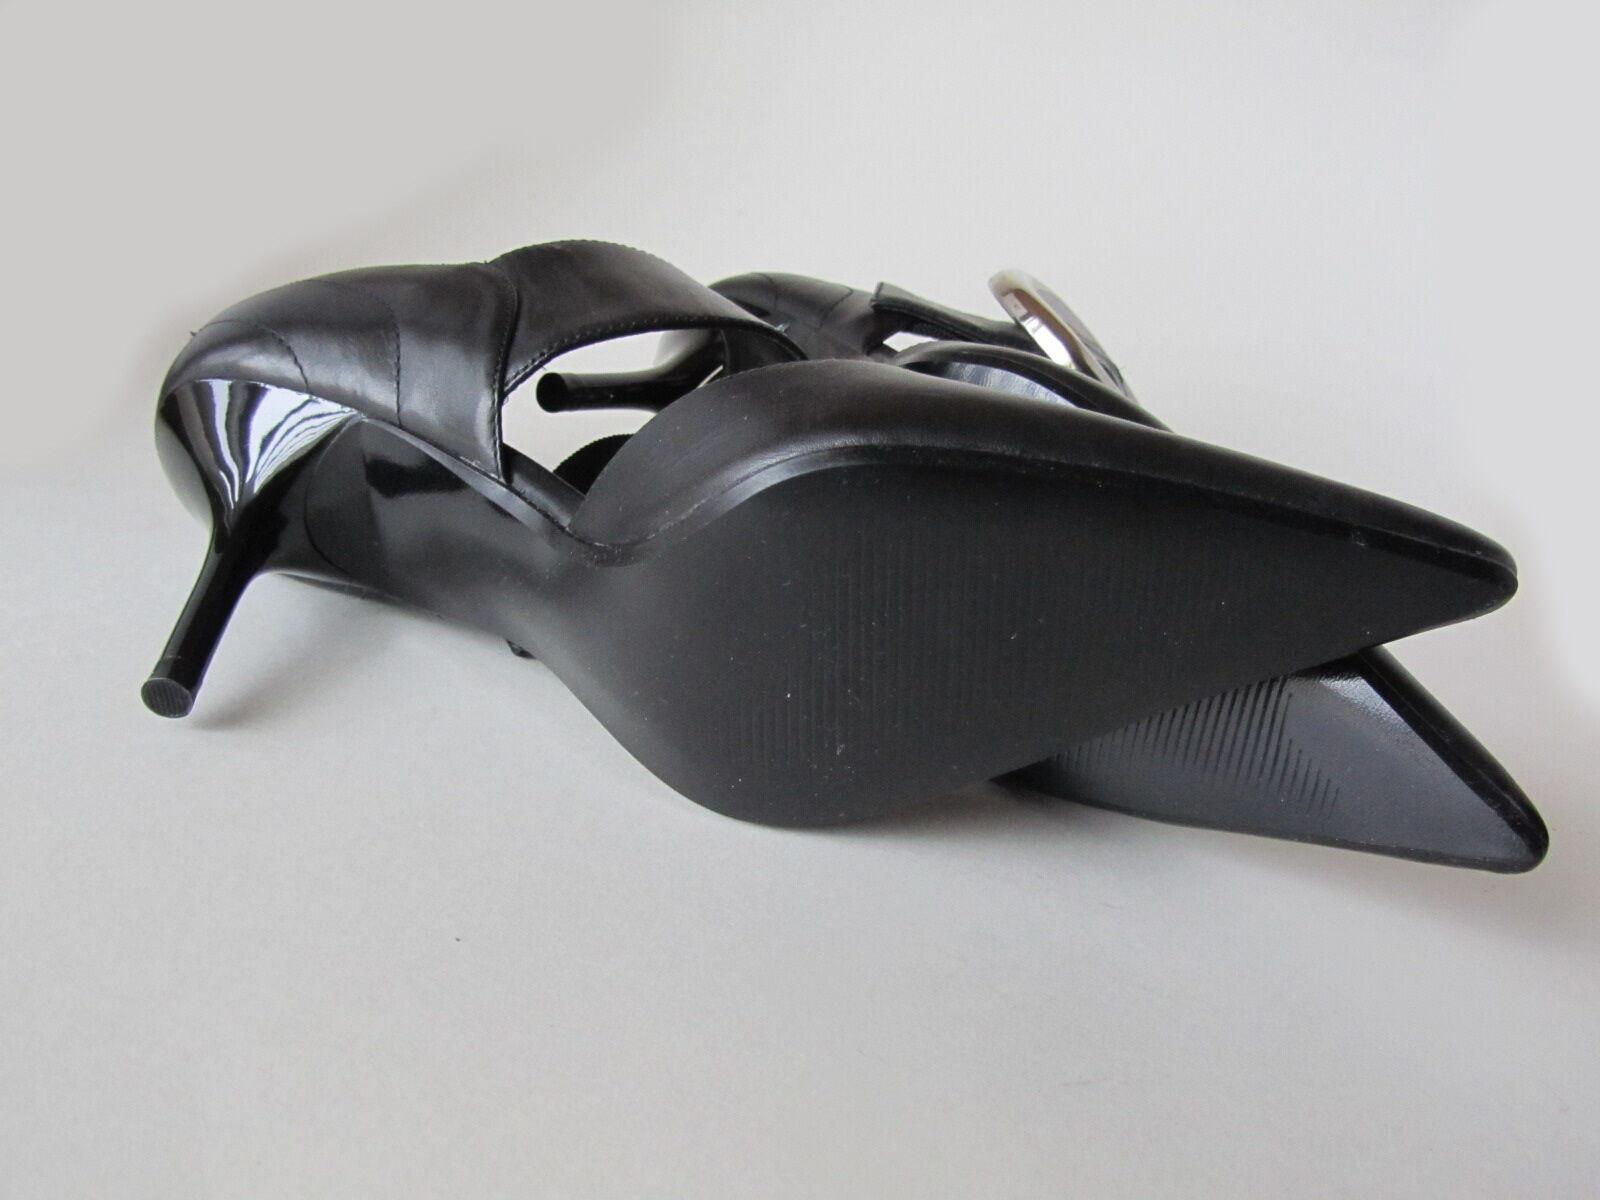 New Steve Madden women's black 5.5 leather shoes size 5.5 black 6cc779